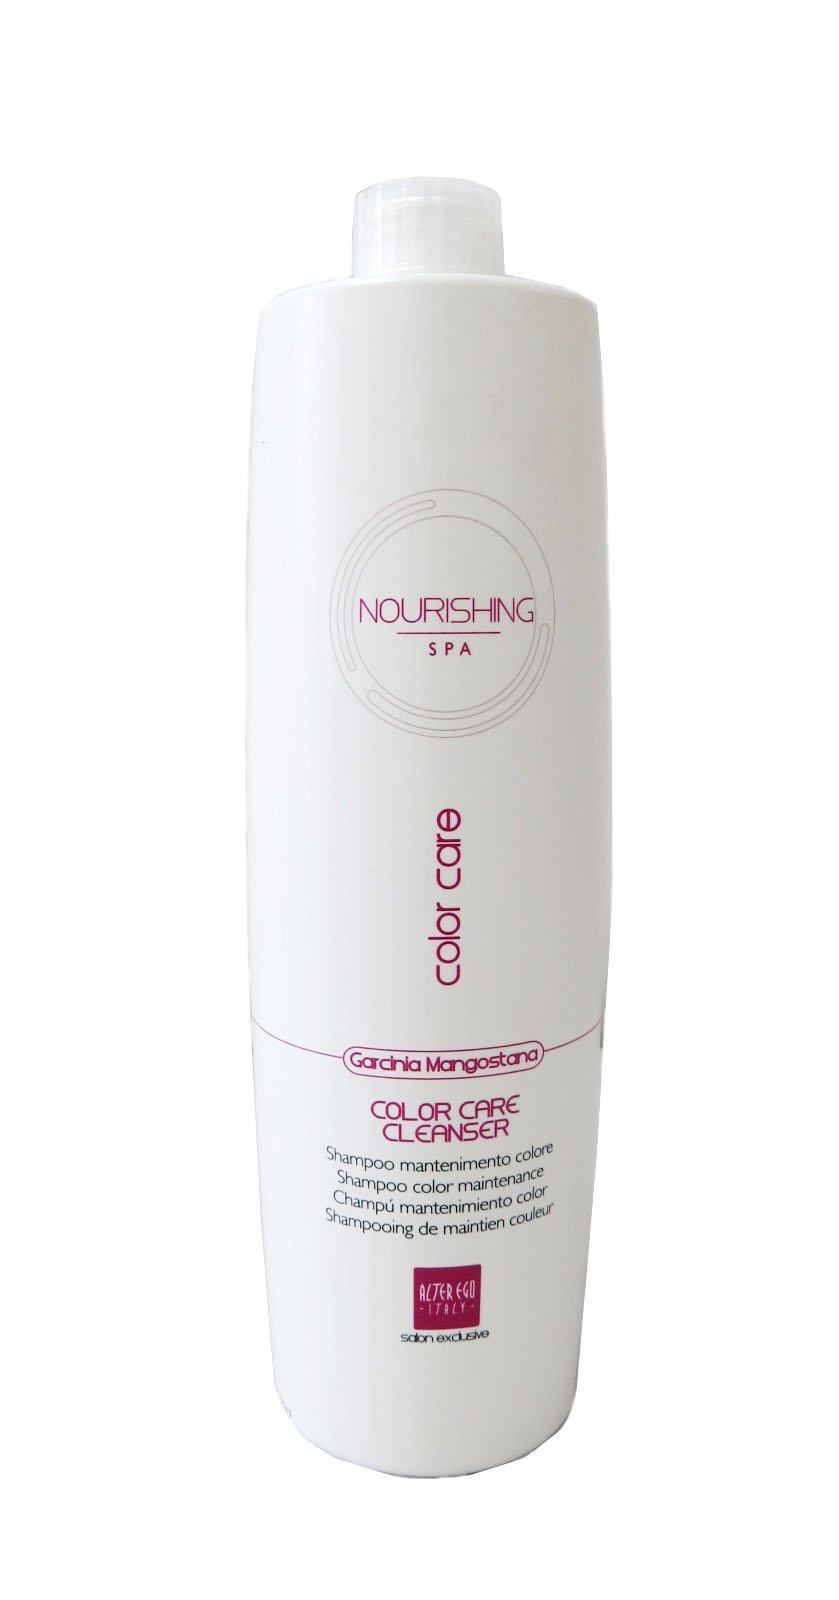 Amazon Alter Ego Nourishing Spa Color Care Cleanser Shampoo